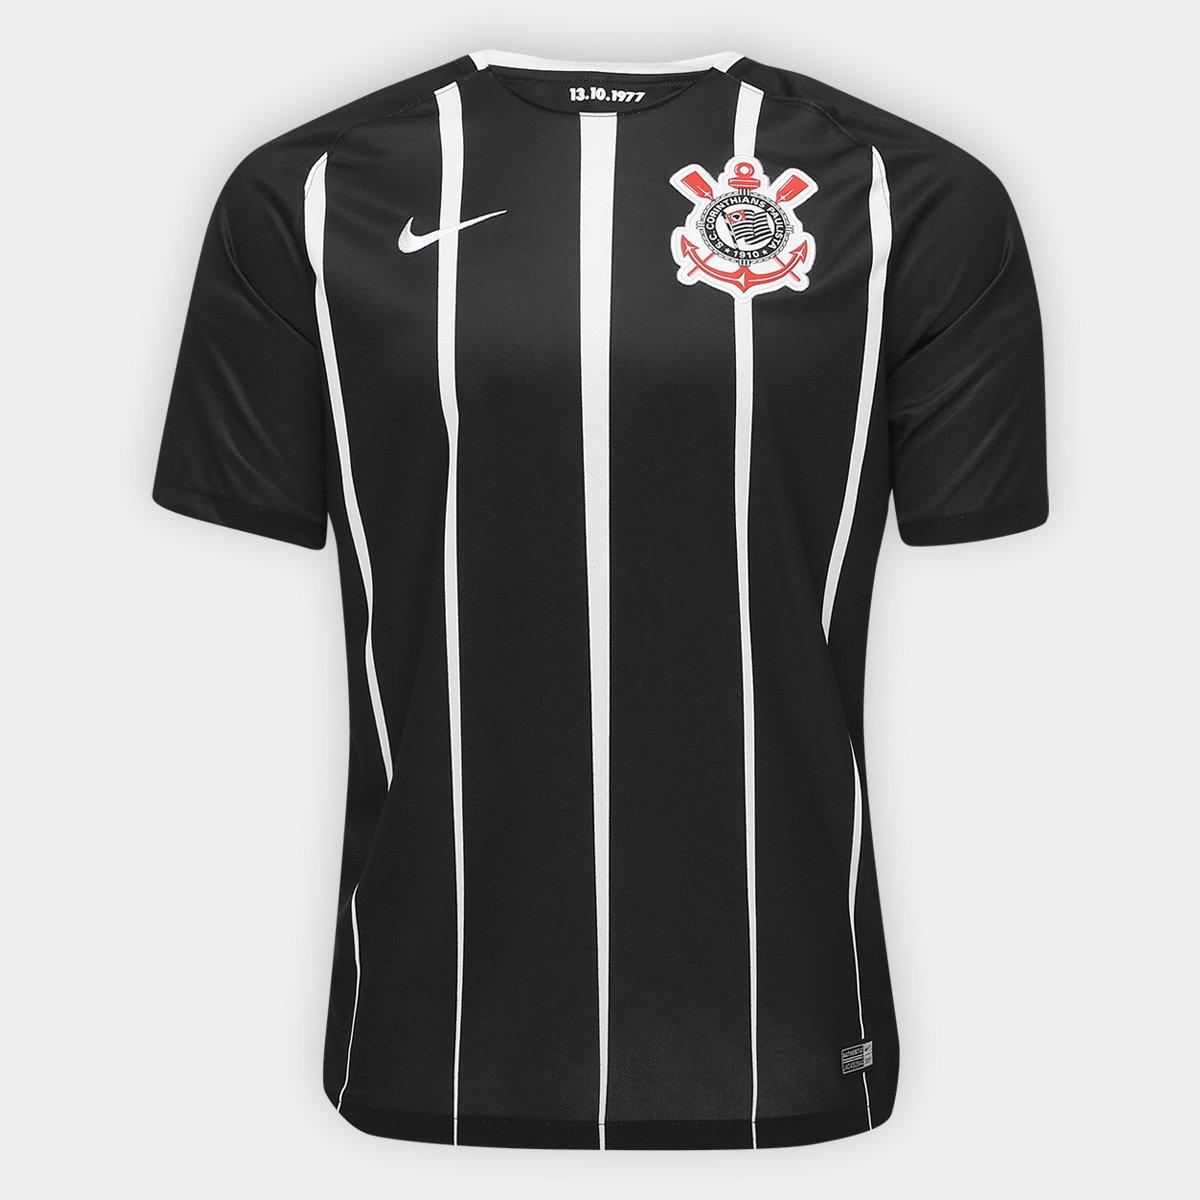 0f345ca18 Camisa Corinthians II 17 18 s nº Torcedor Nike Masculina - Preto e Branco -  Compre Agora